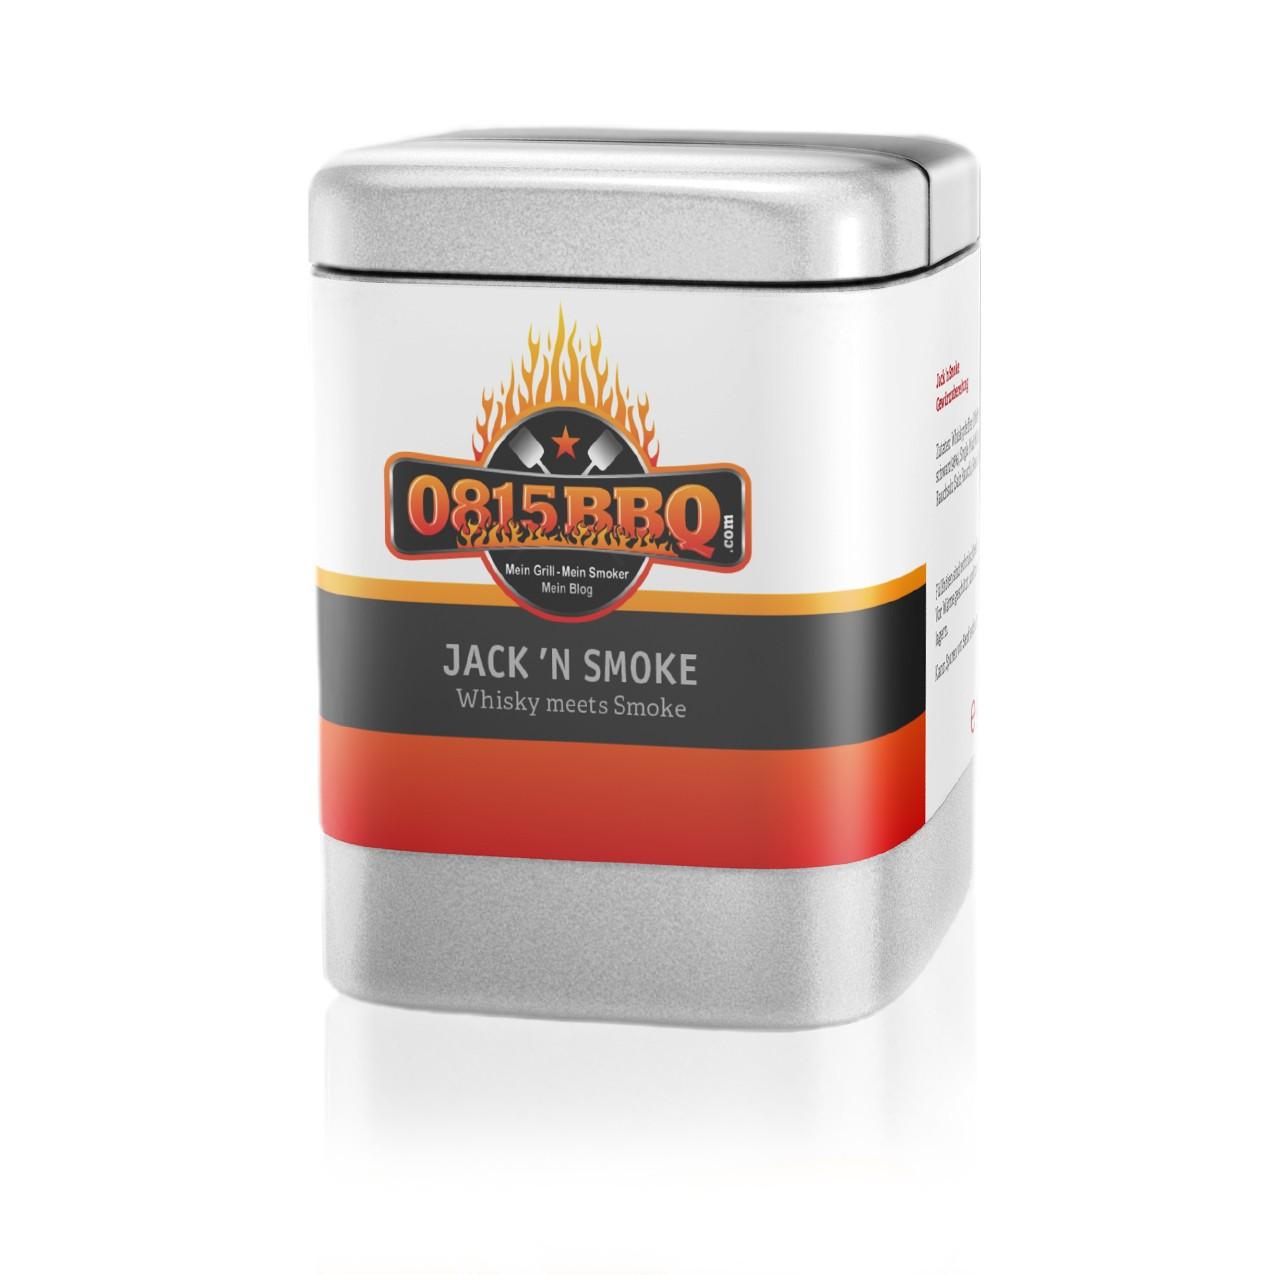 0815 Jack 'n Smoke